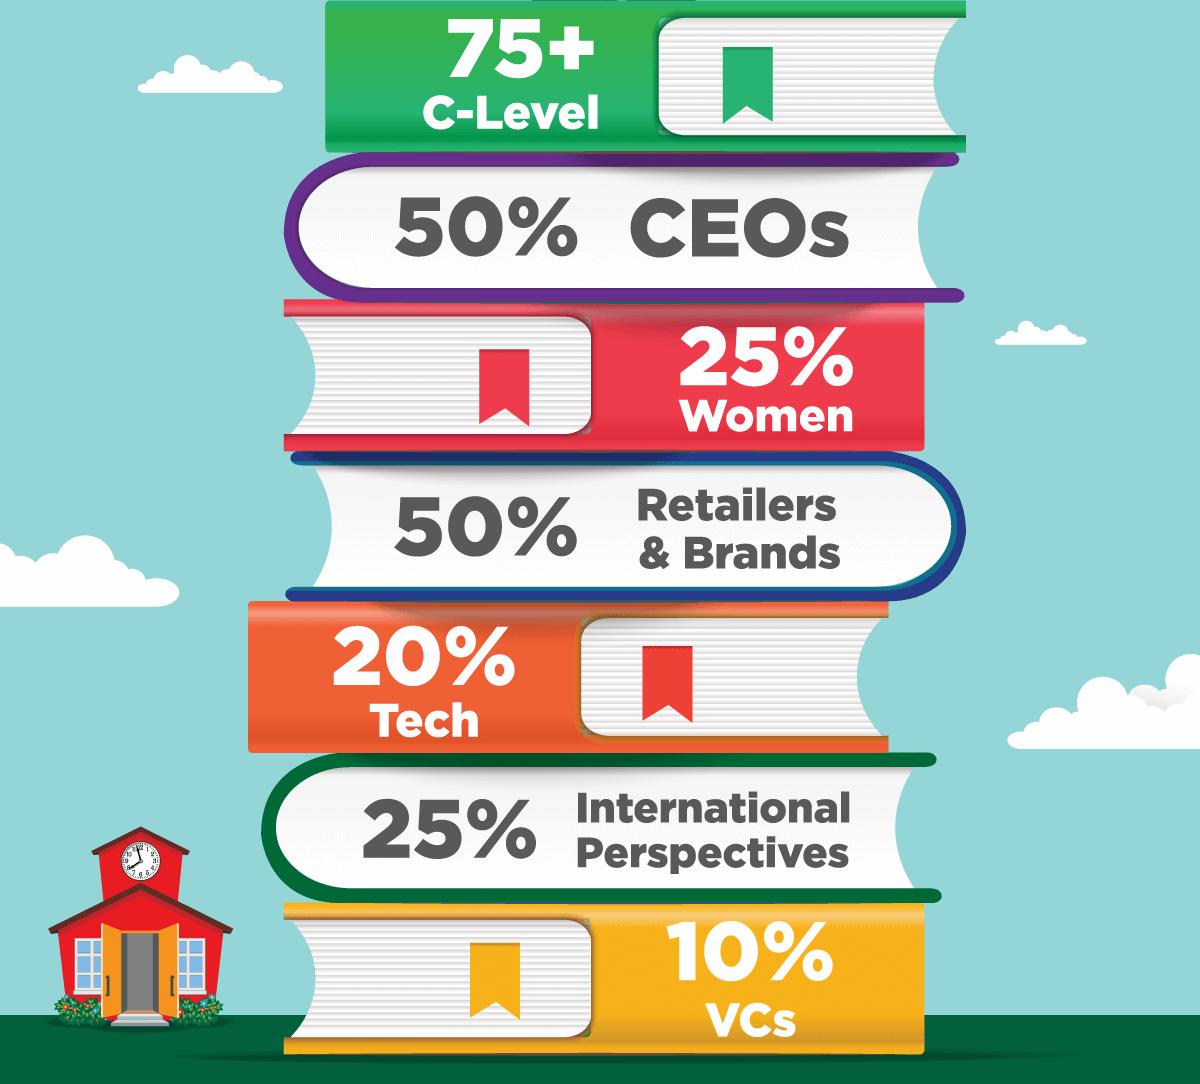 75+ C-Level, 50% CEOs, 25% Women, 50% Retailers & Brands, 20% Tech, 25% International Perspectives, 10% VCs